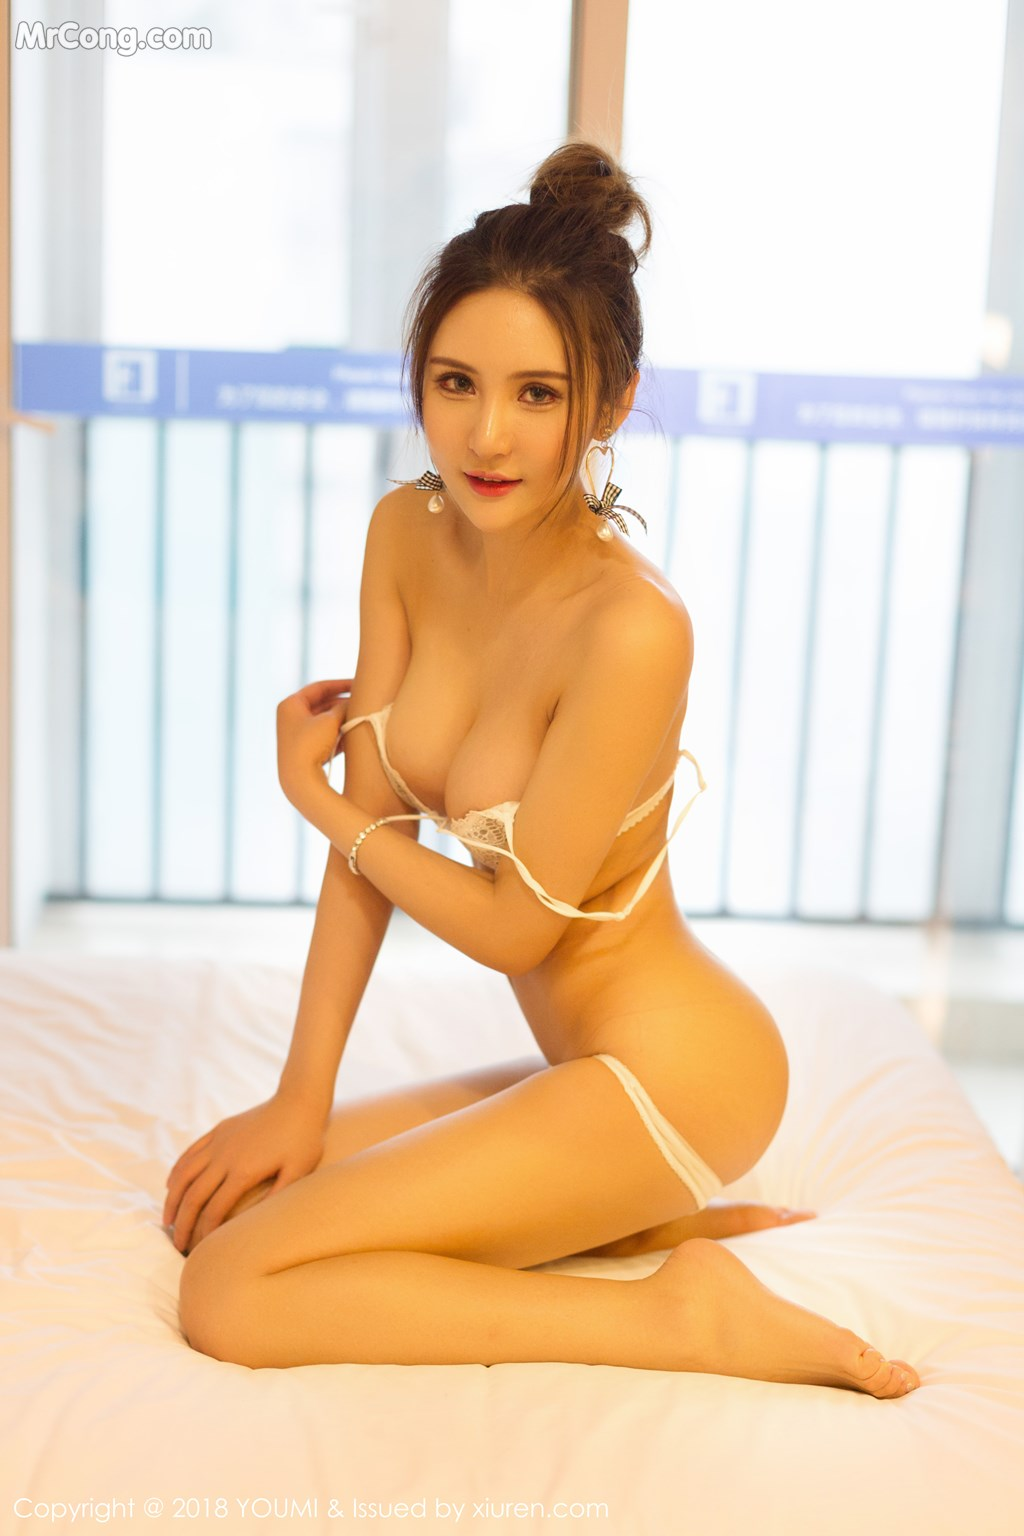 Image YouMi-Vol.125-SOLO-MrCong.com-007 in post YouMi Vol.125: Người mẫu SOLO-尹菲 (41 ảnh)